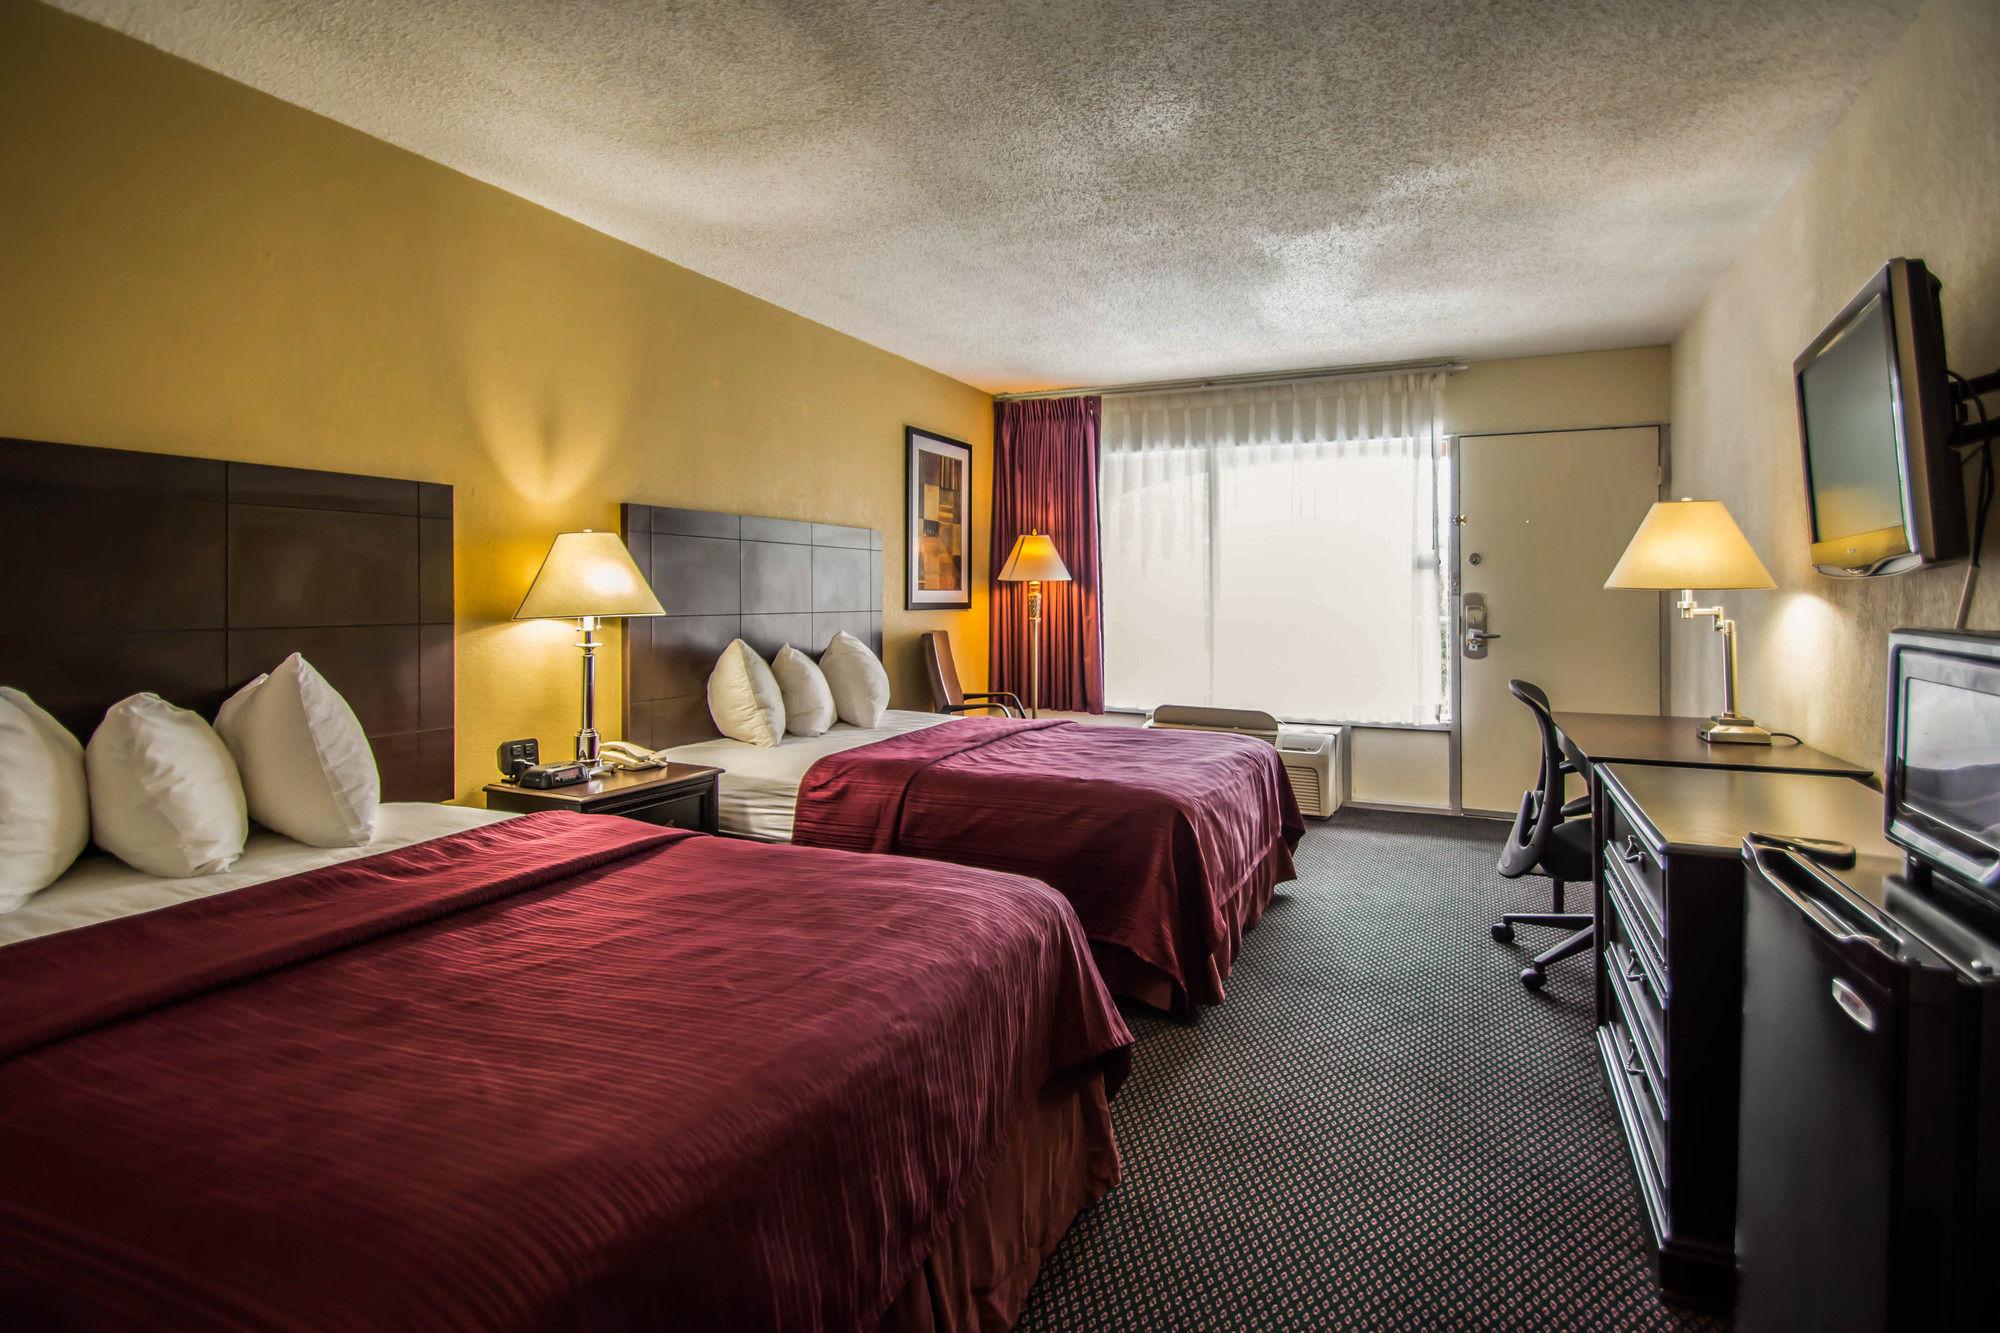 Quality Inn Alachua in Alachua, FL